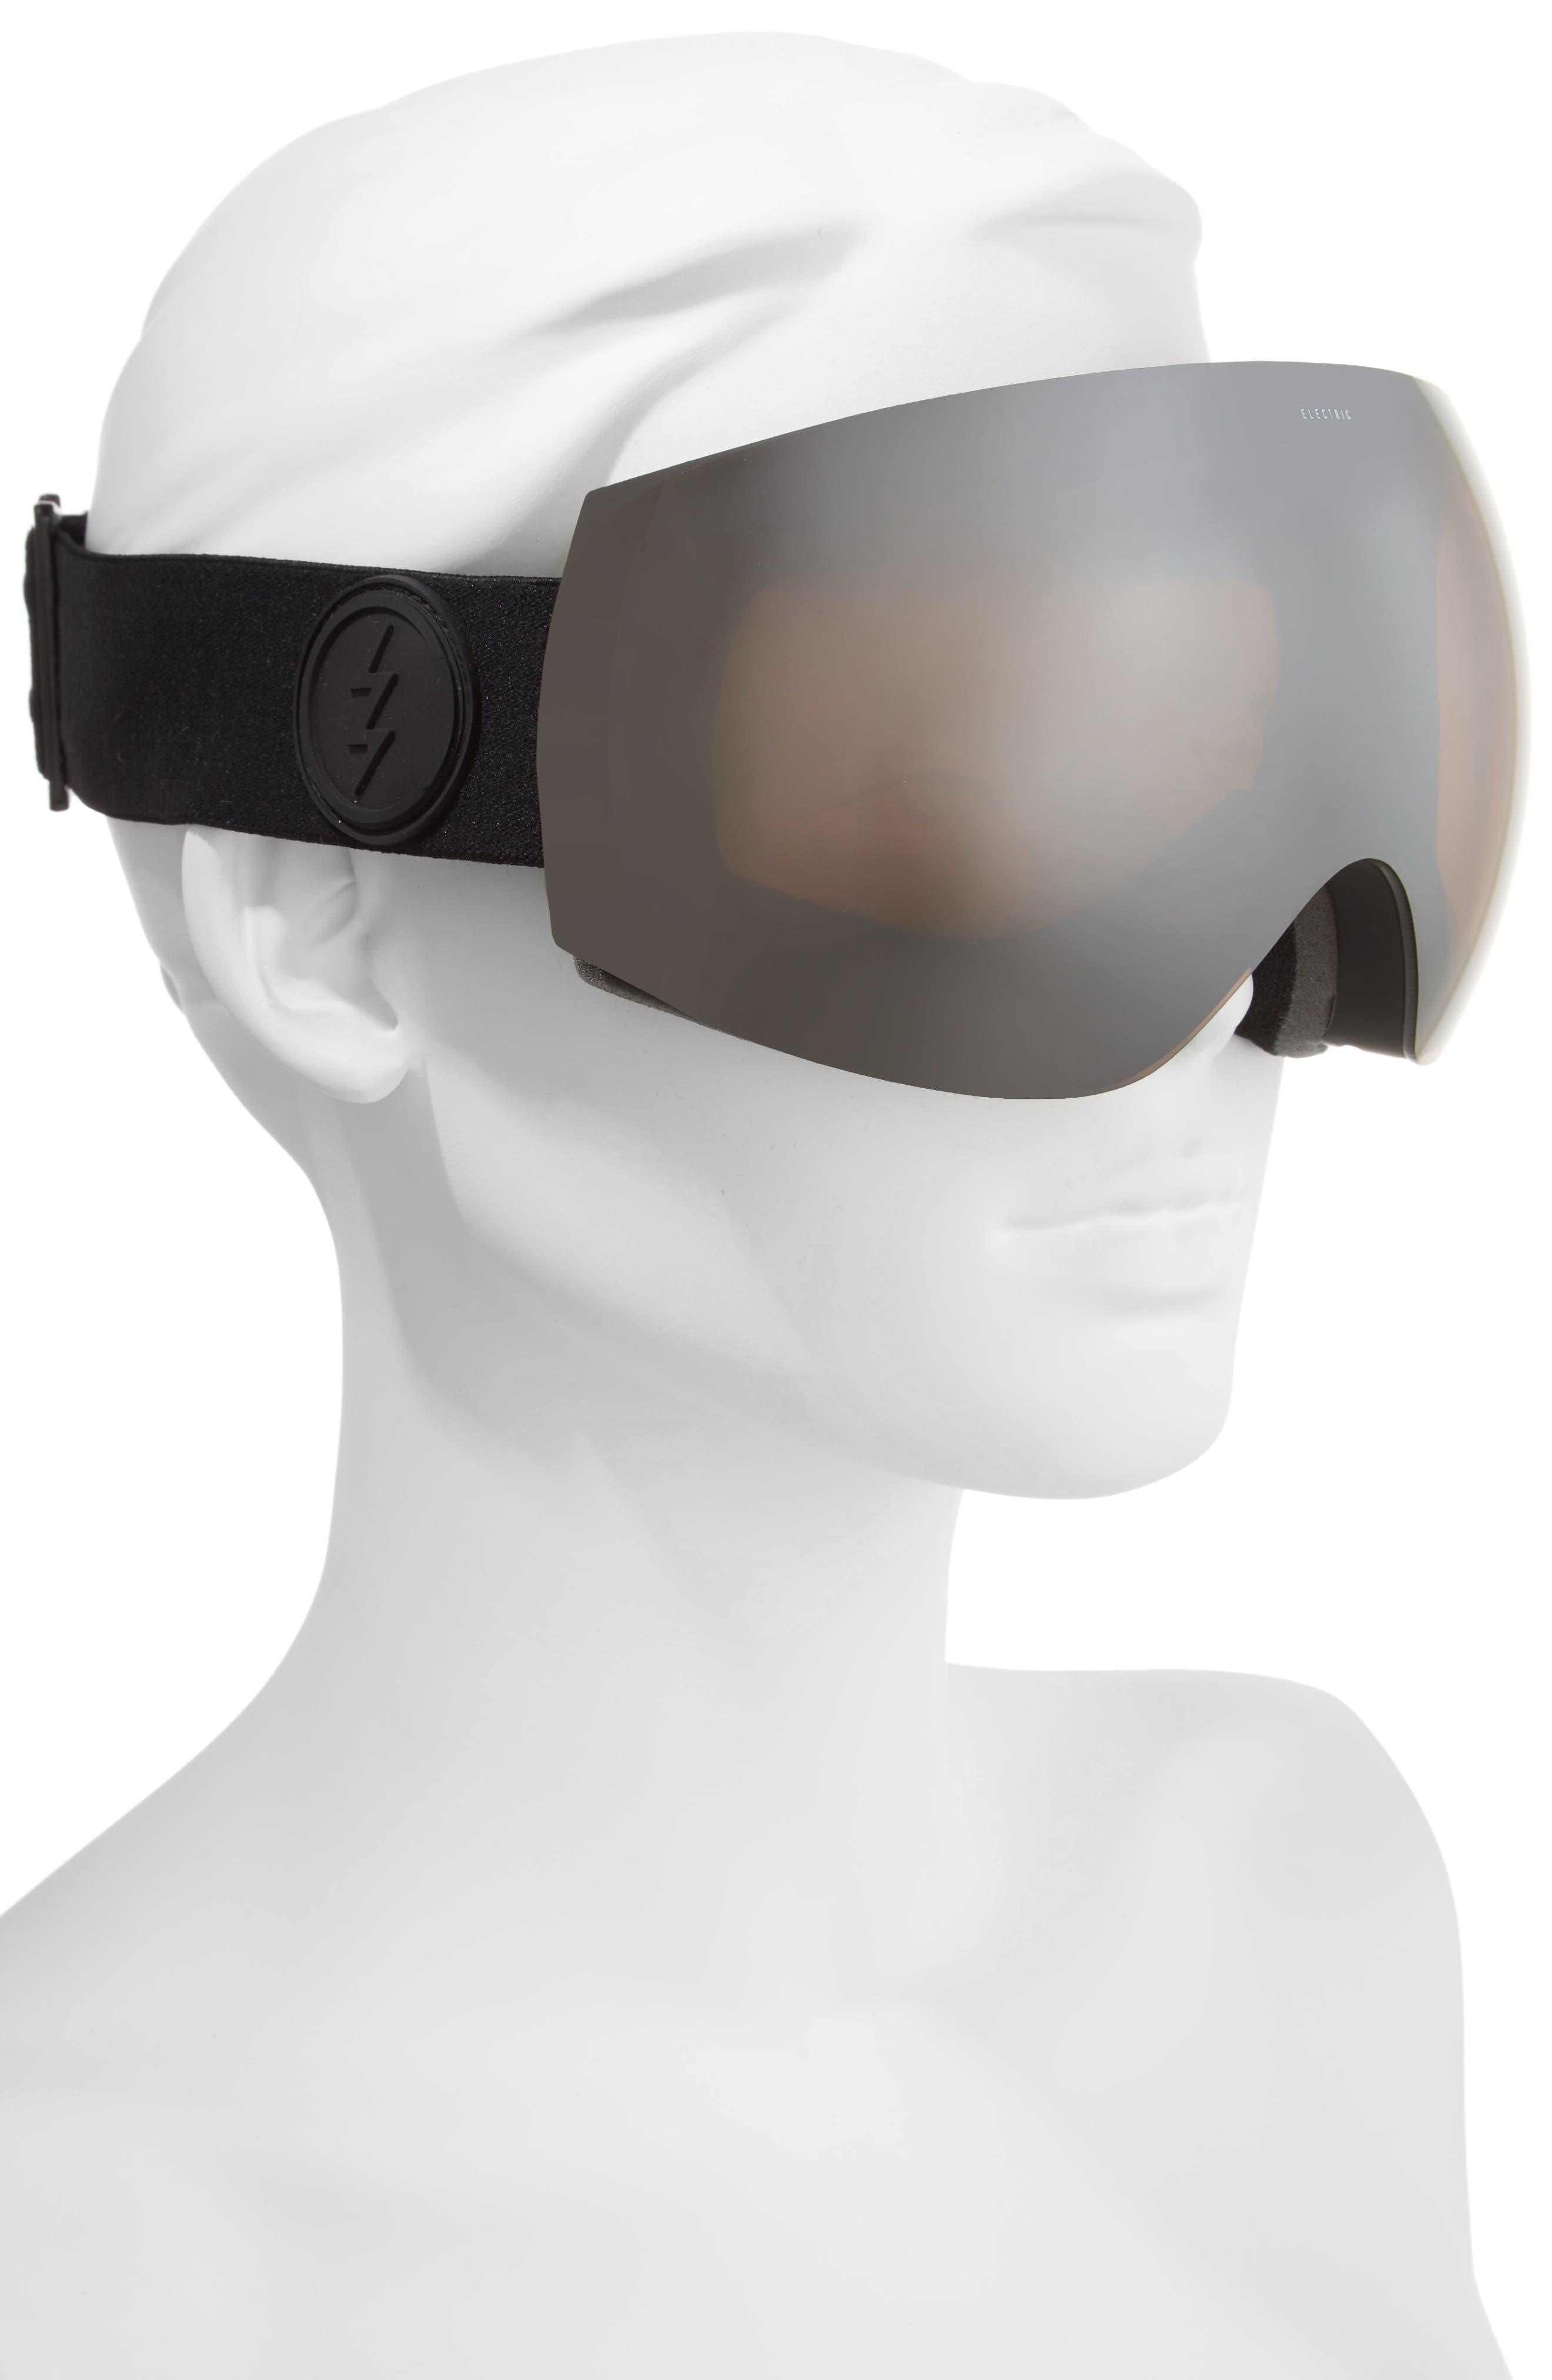 EG3 Snow Goggles,                             Alternate thumbnail 2, color,                             Matte Black/ Silver Chrome